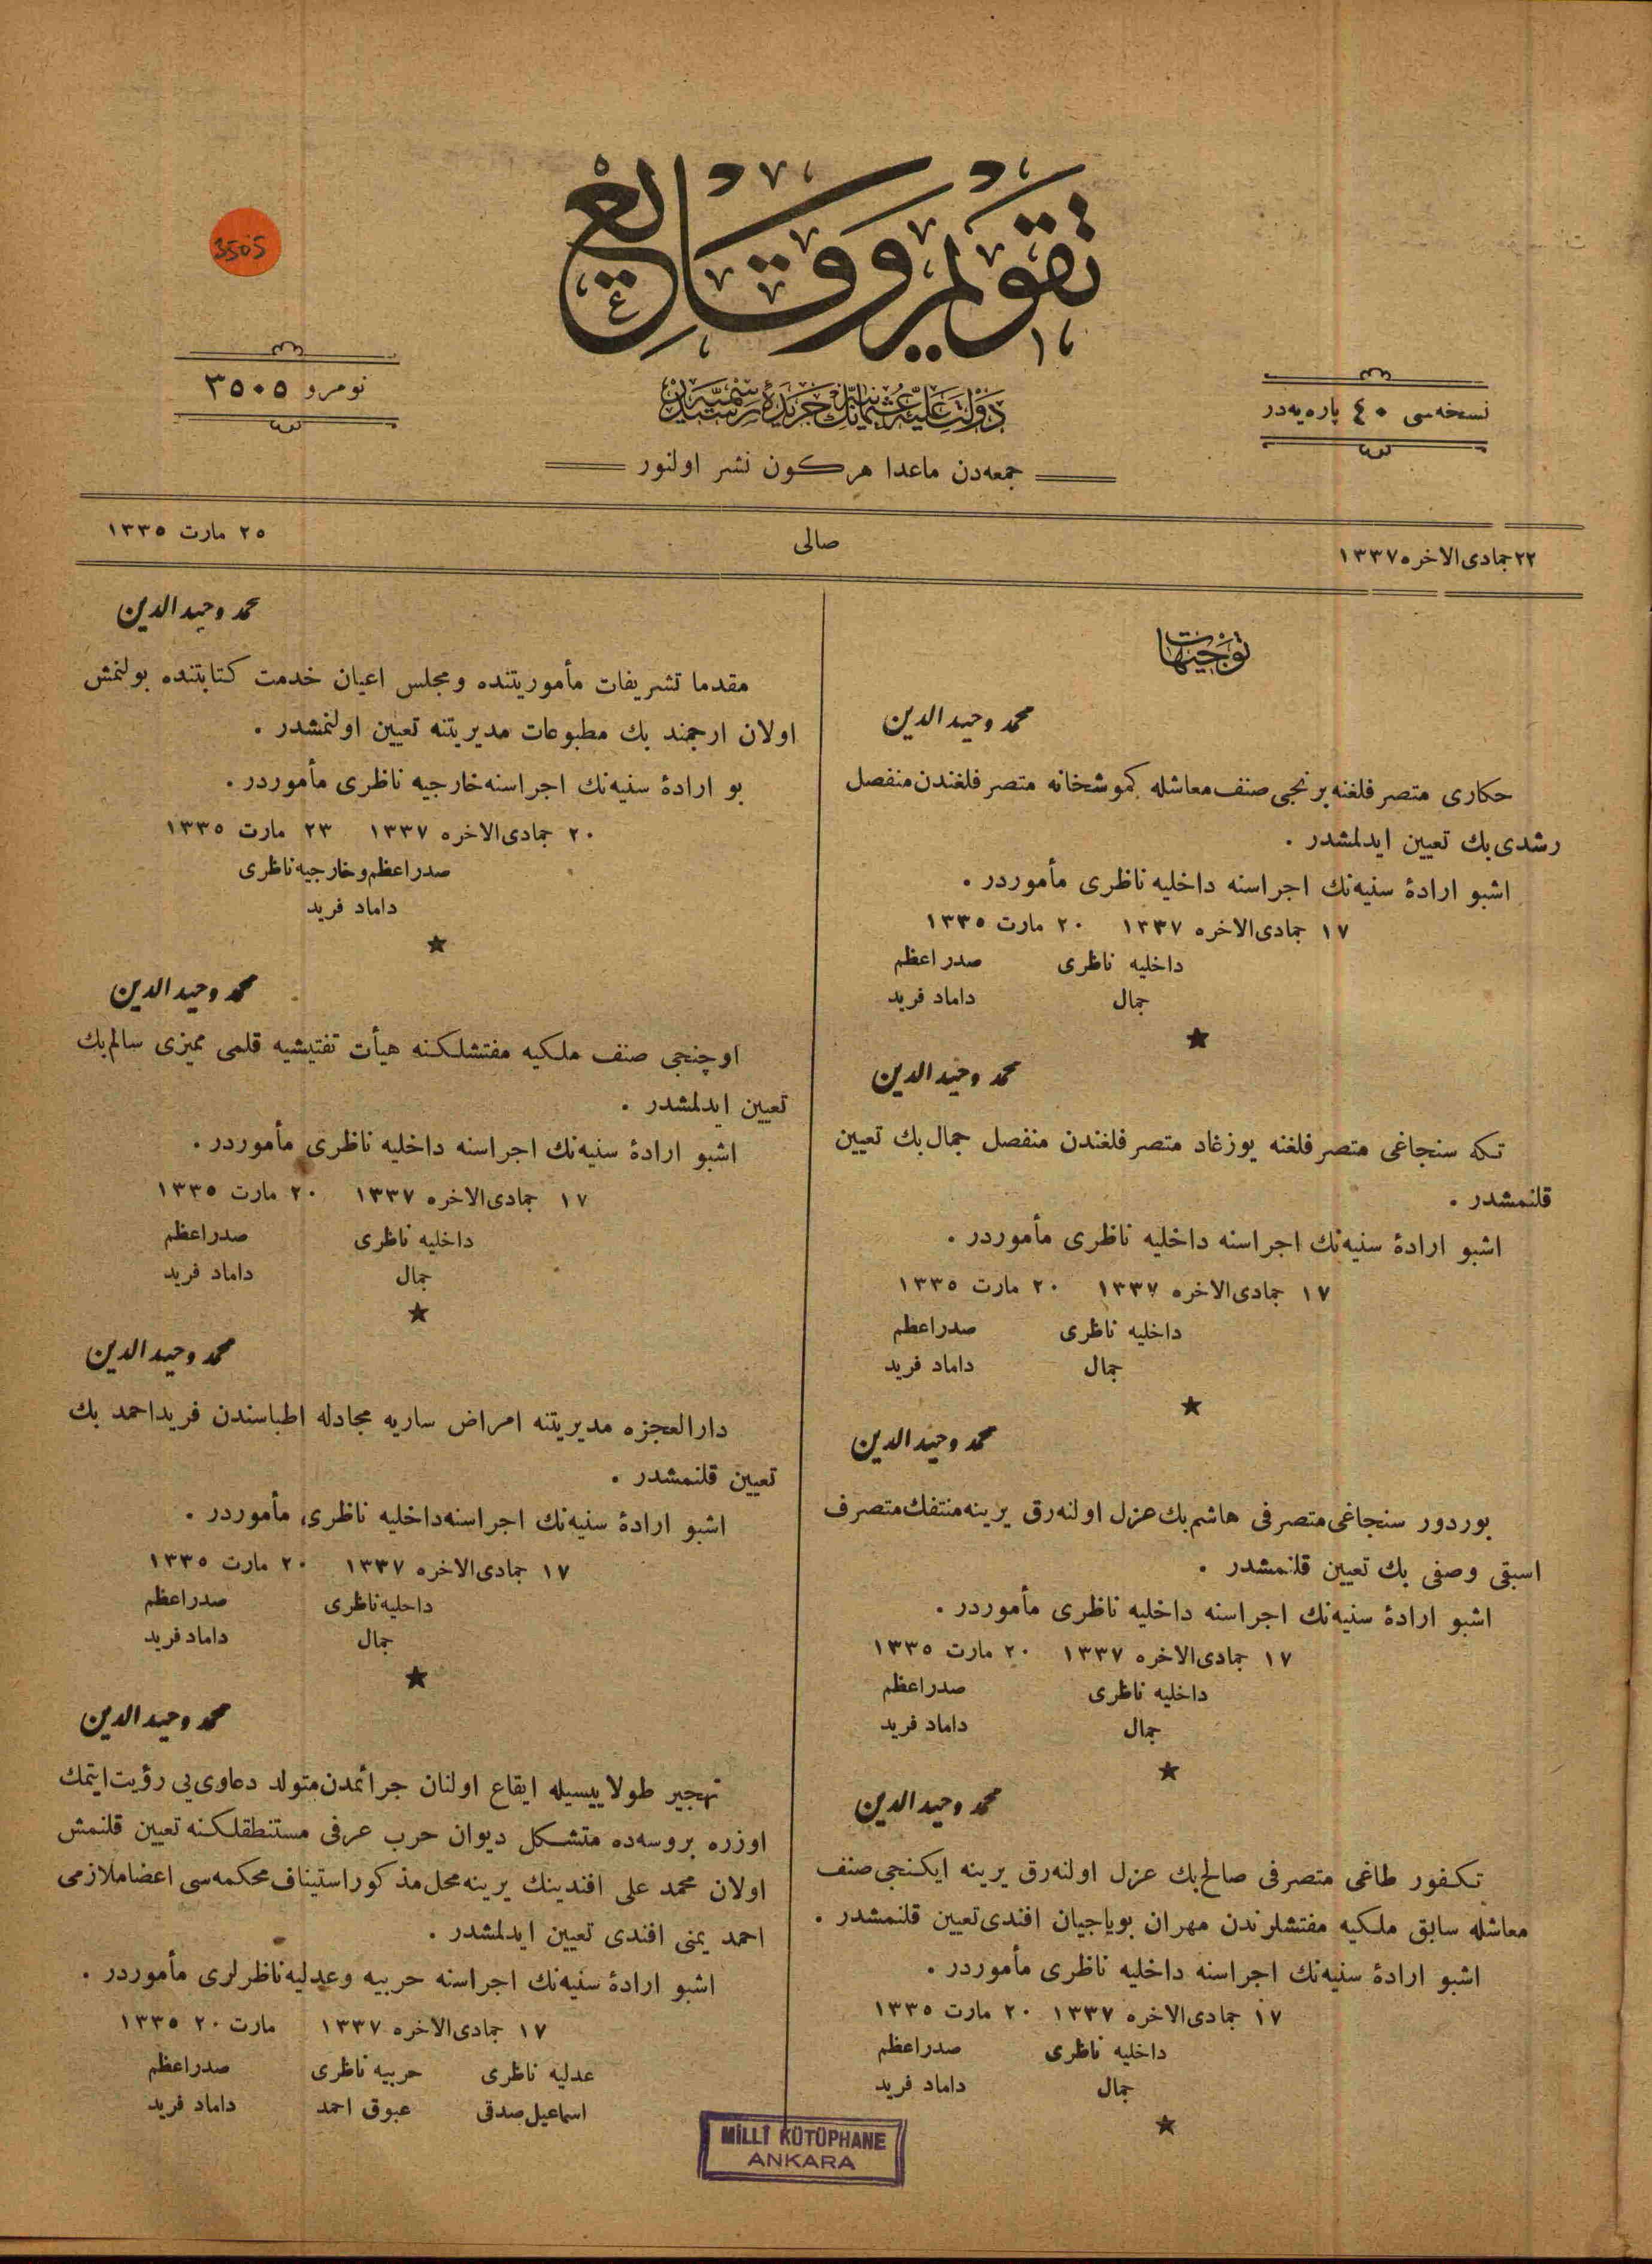 25 Mart 1919 Tarihli Takvim-i Vekayi Gazetesi Sayfa 1